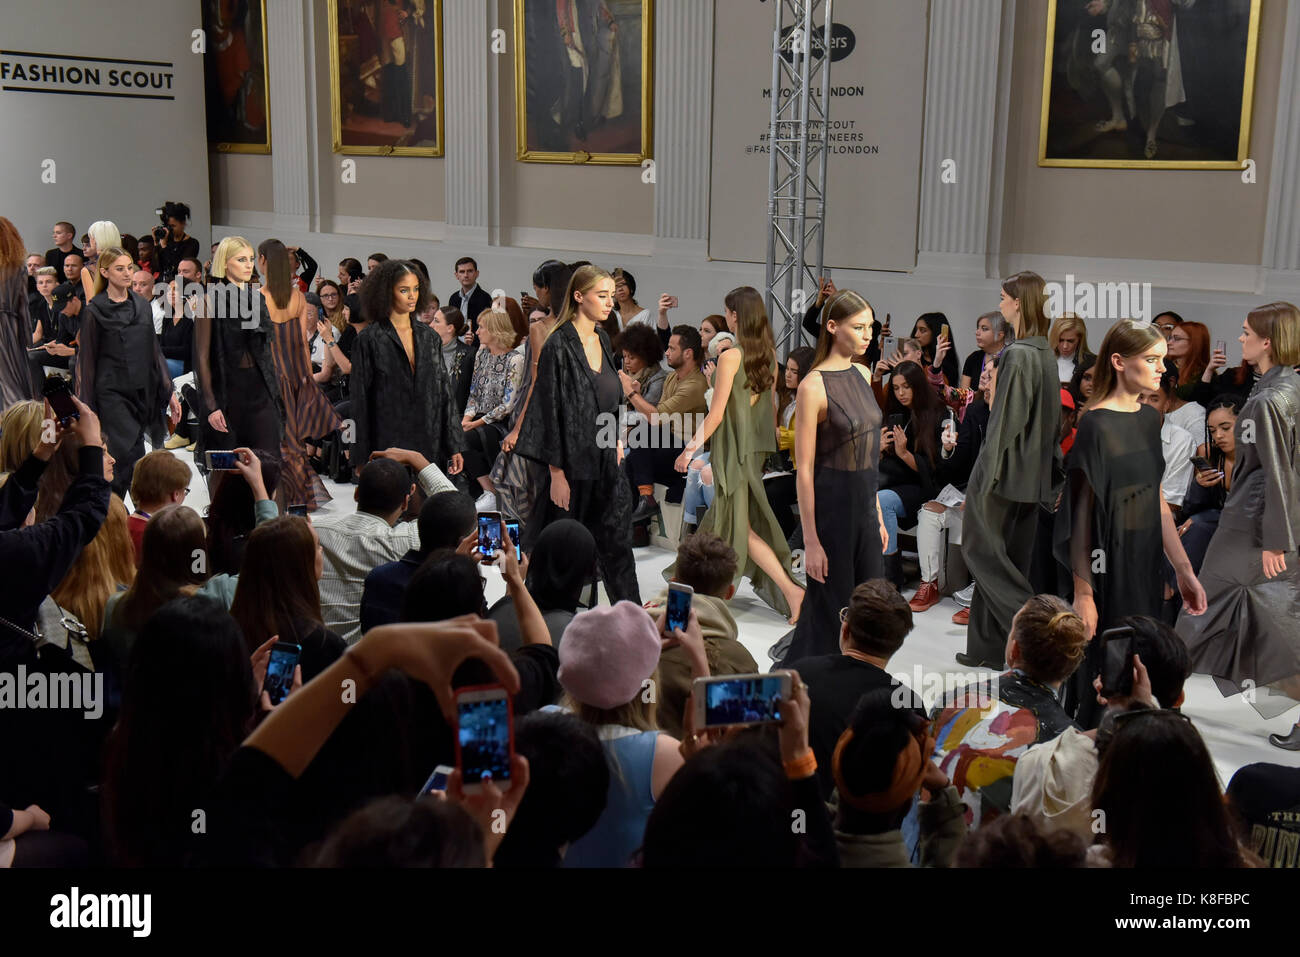 Londres, Reino Unido. 18 Sep, 2017. Modelos presentan looks de moda IRYNVIGRE Scout en Covent Garden, uno de los tantos lugares hosting London Fashion Week SS18. Crédito: Stephen Chung/Alamy Live News Foto de stock